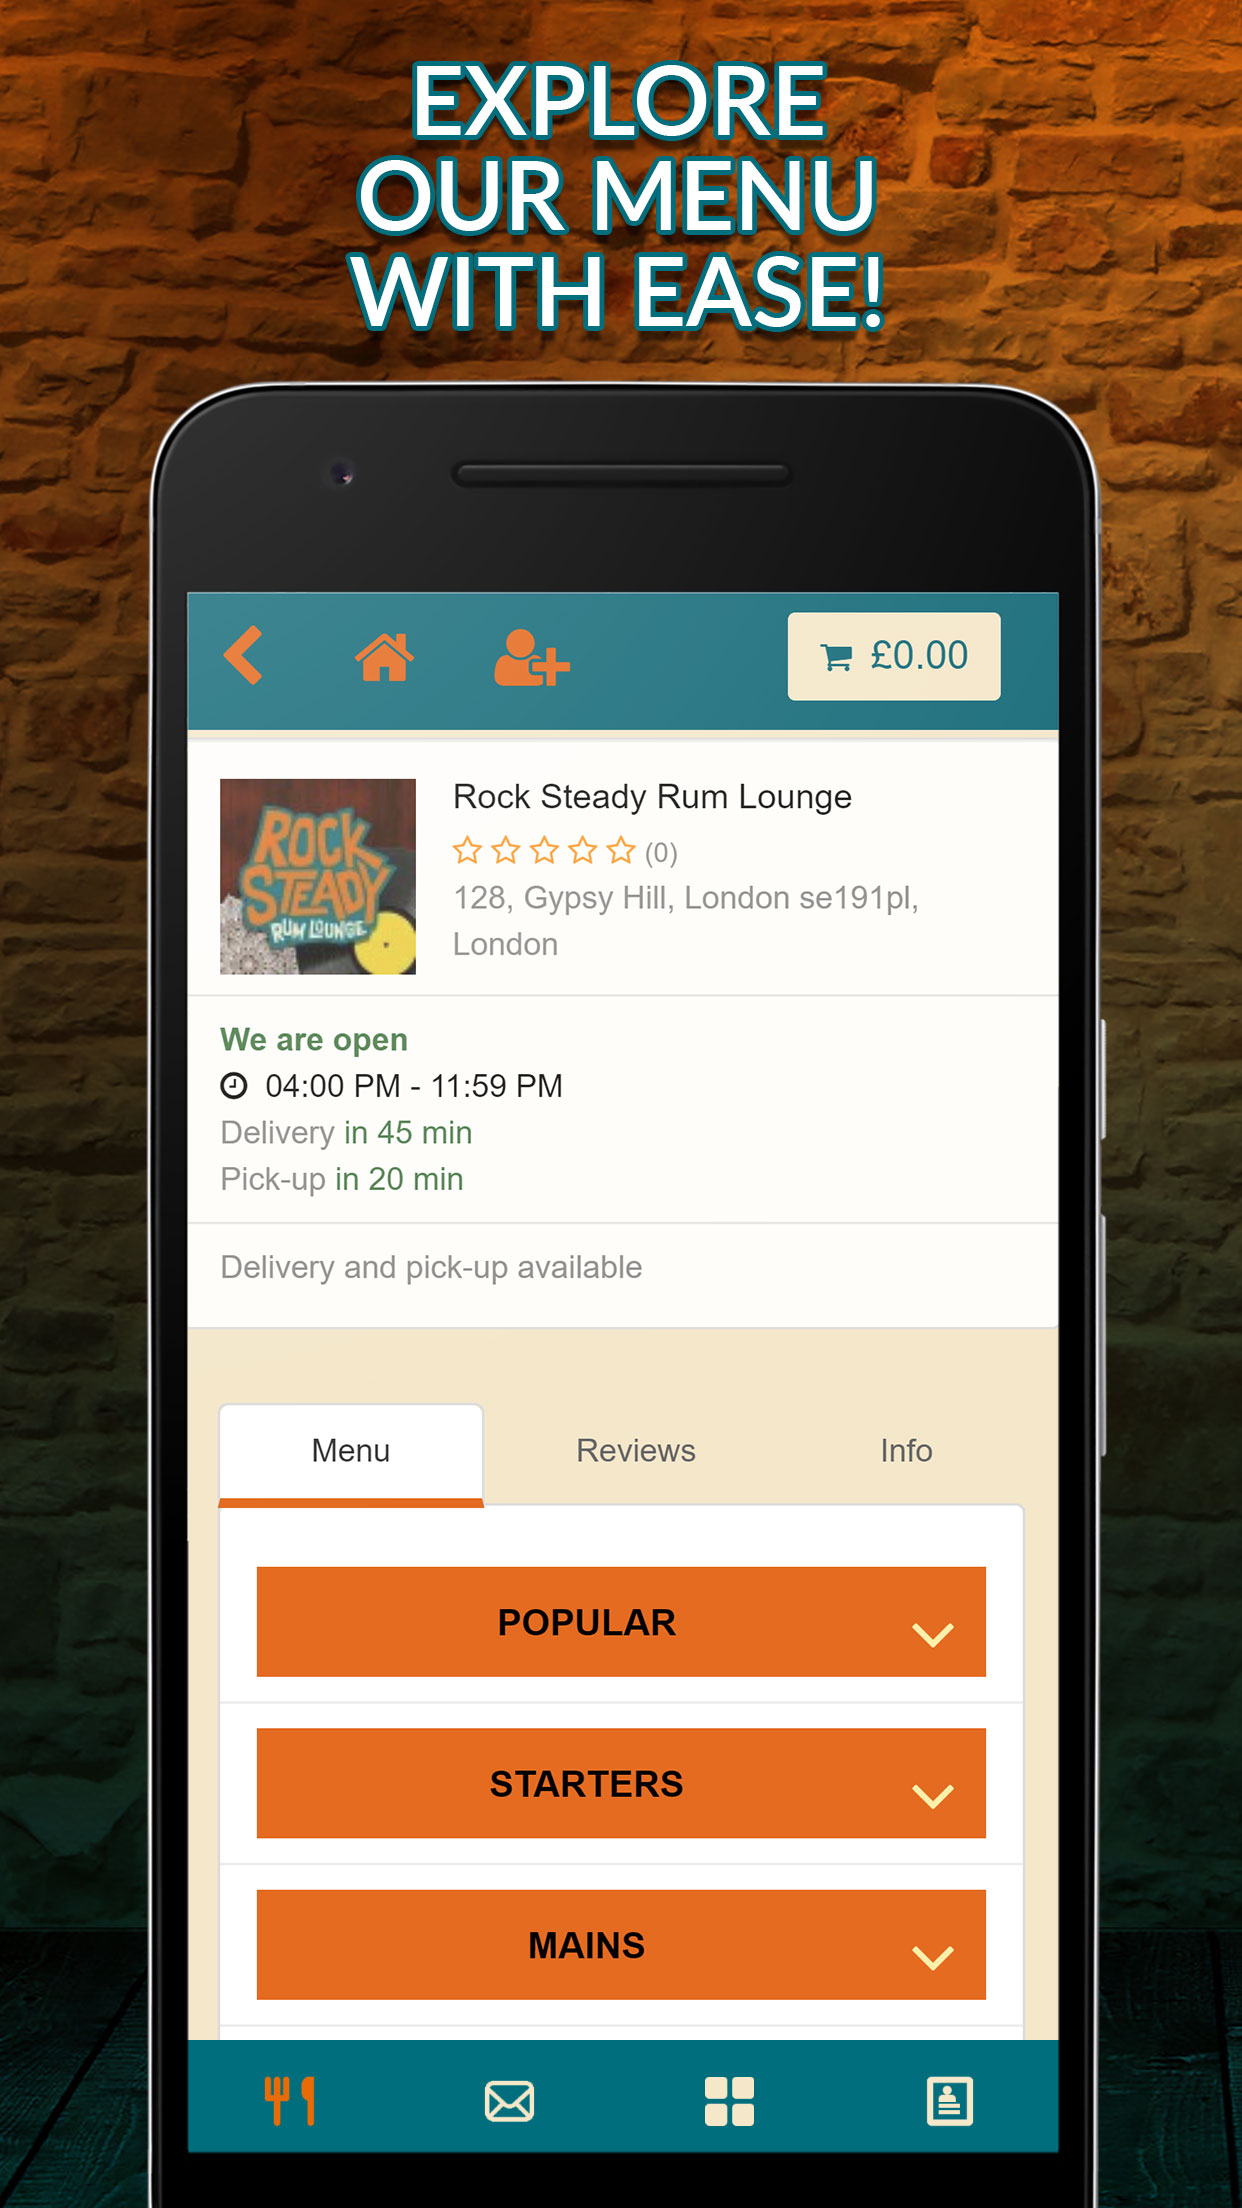 Rock Steady Rum Lounge